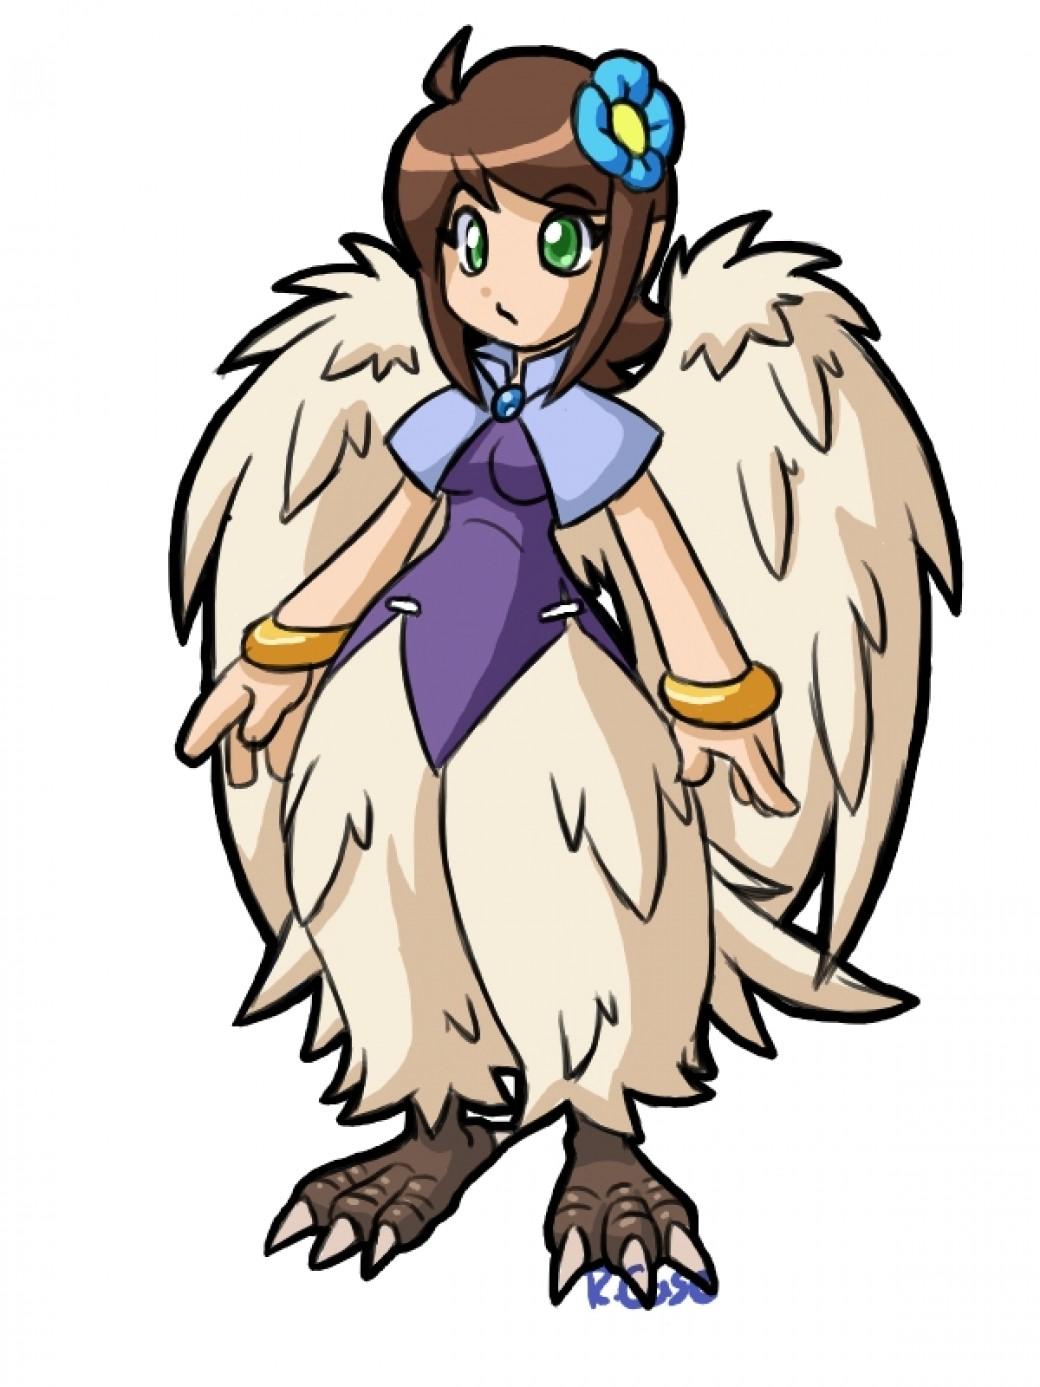 random Harpy girl doodle por rongs1234